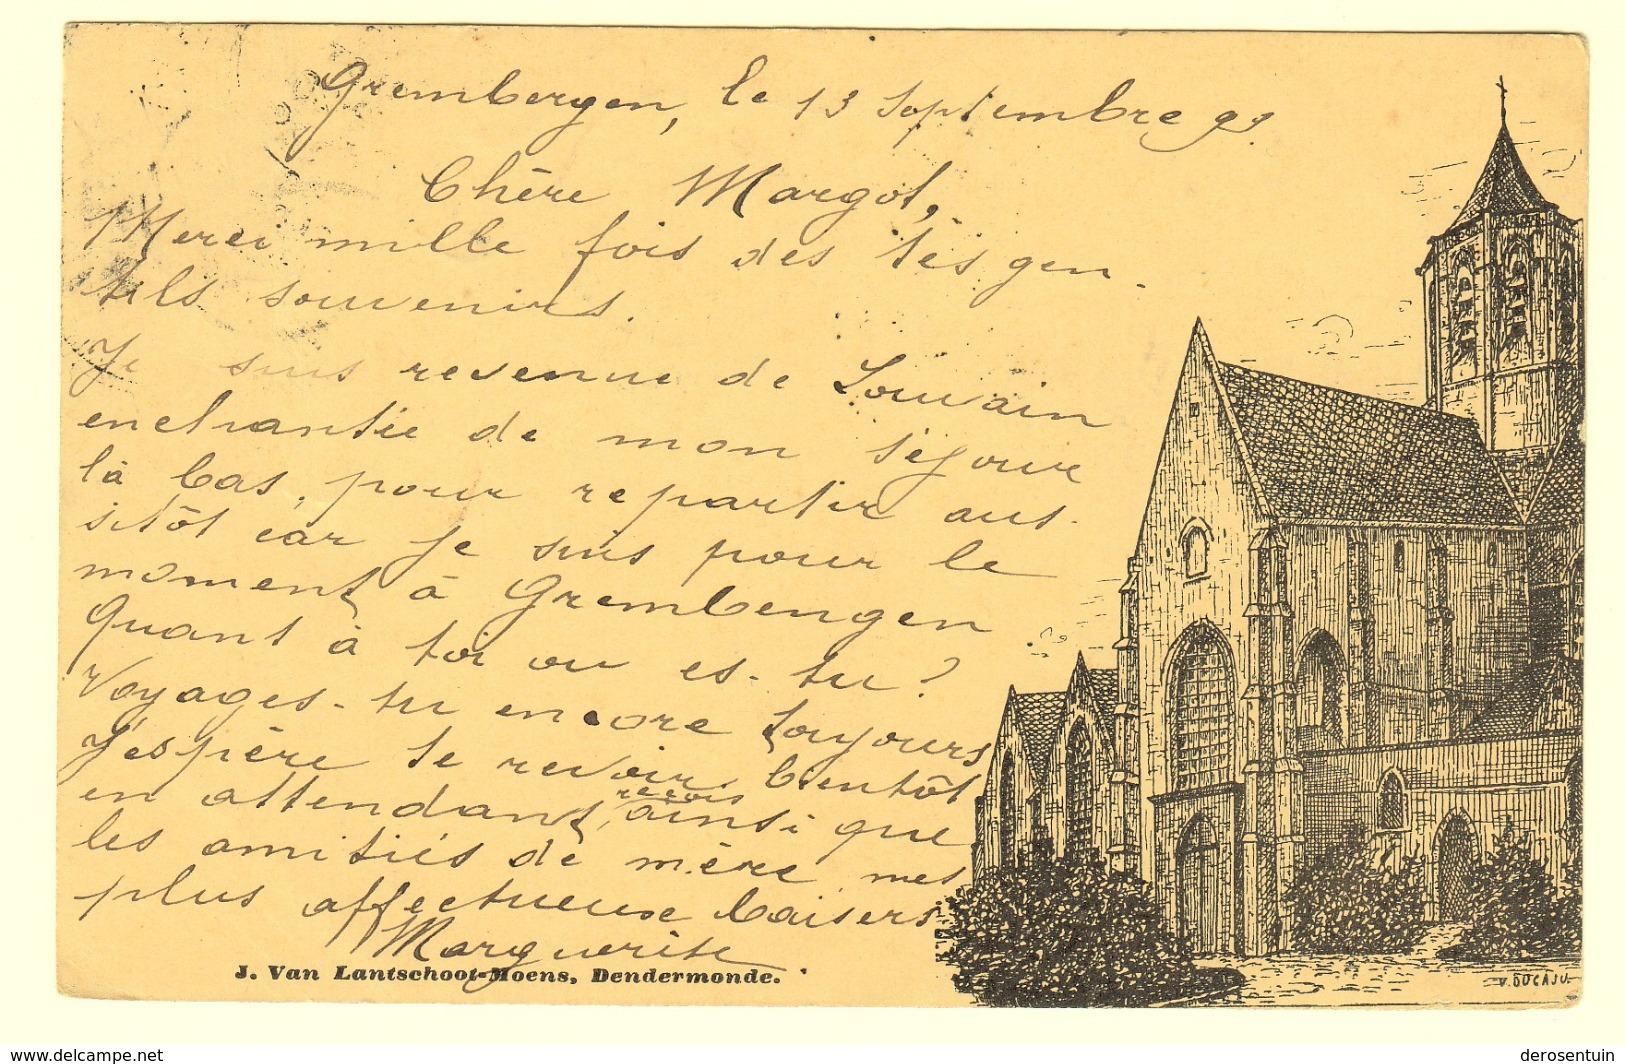 A0085[Postkaart] [Dendermonde Onze Lieve Vrouwkerk] (J. Van Lantschoot-Moens) [1899 Ducaju Kerk Termonde église] - Dendermonde